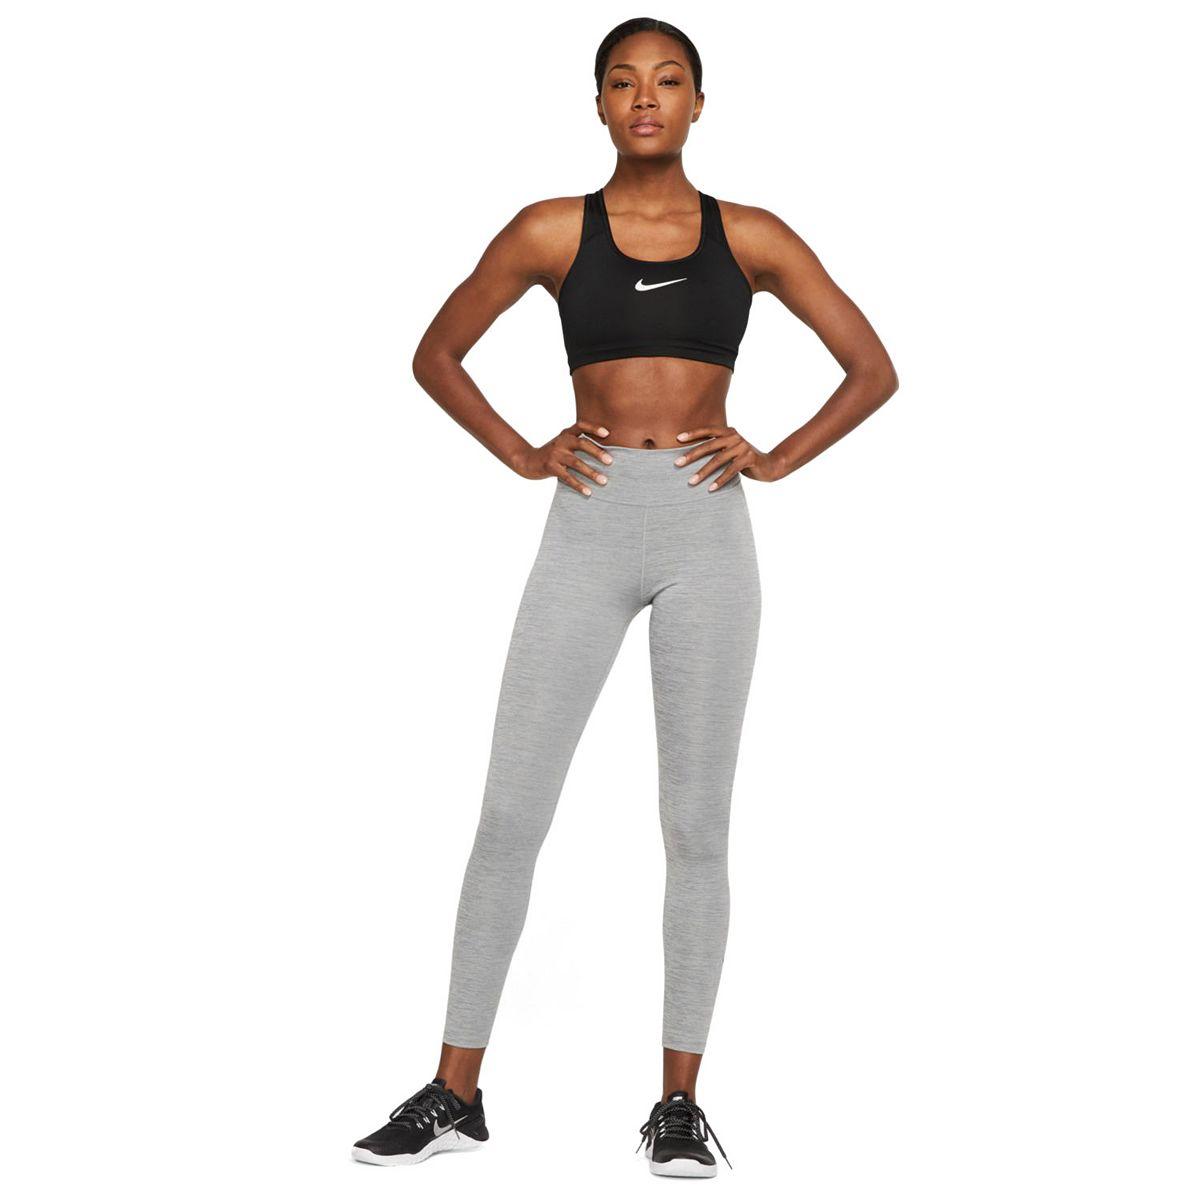 Women's Nike One Midrise Leggings Black White g6g5j